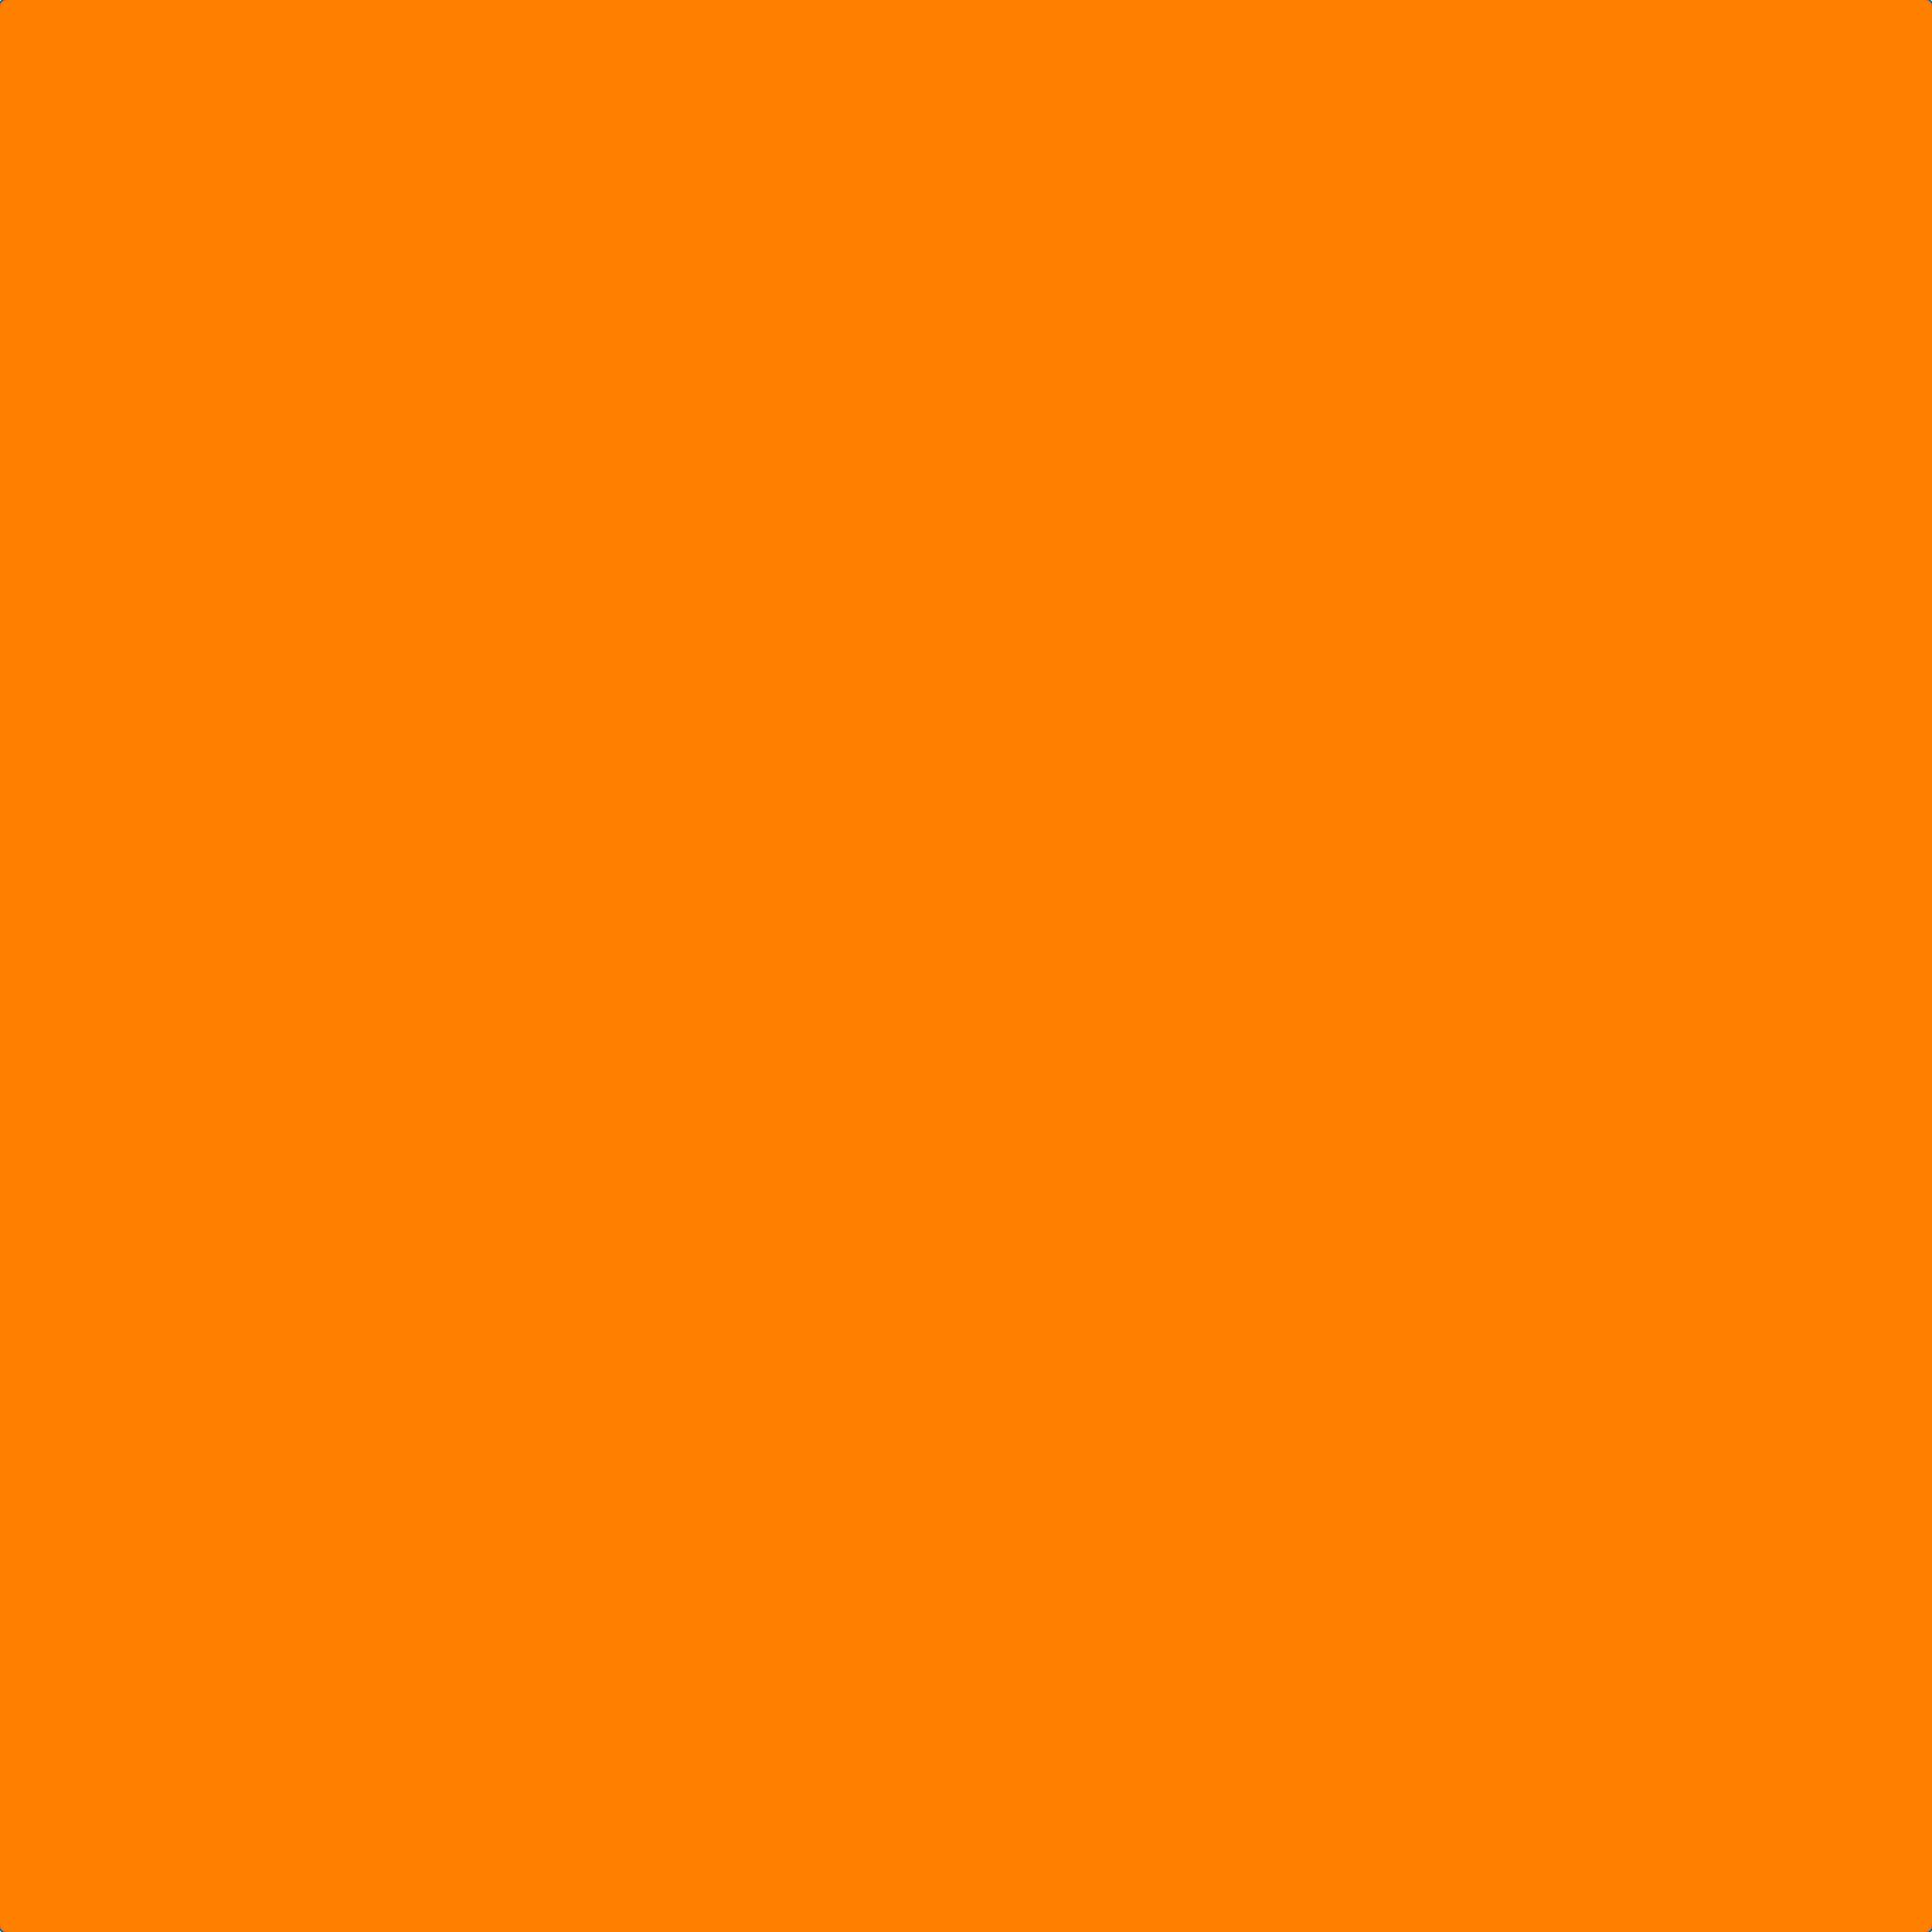 neon orange backgrounds wallpapersafari